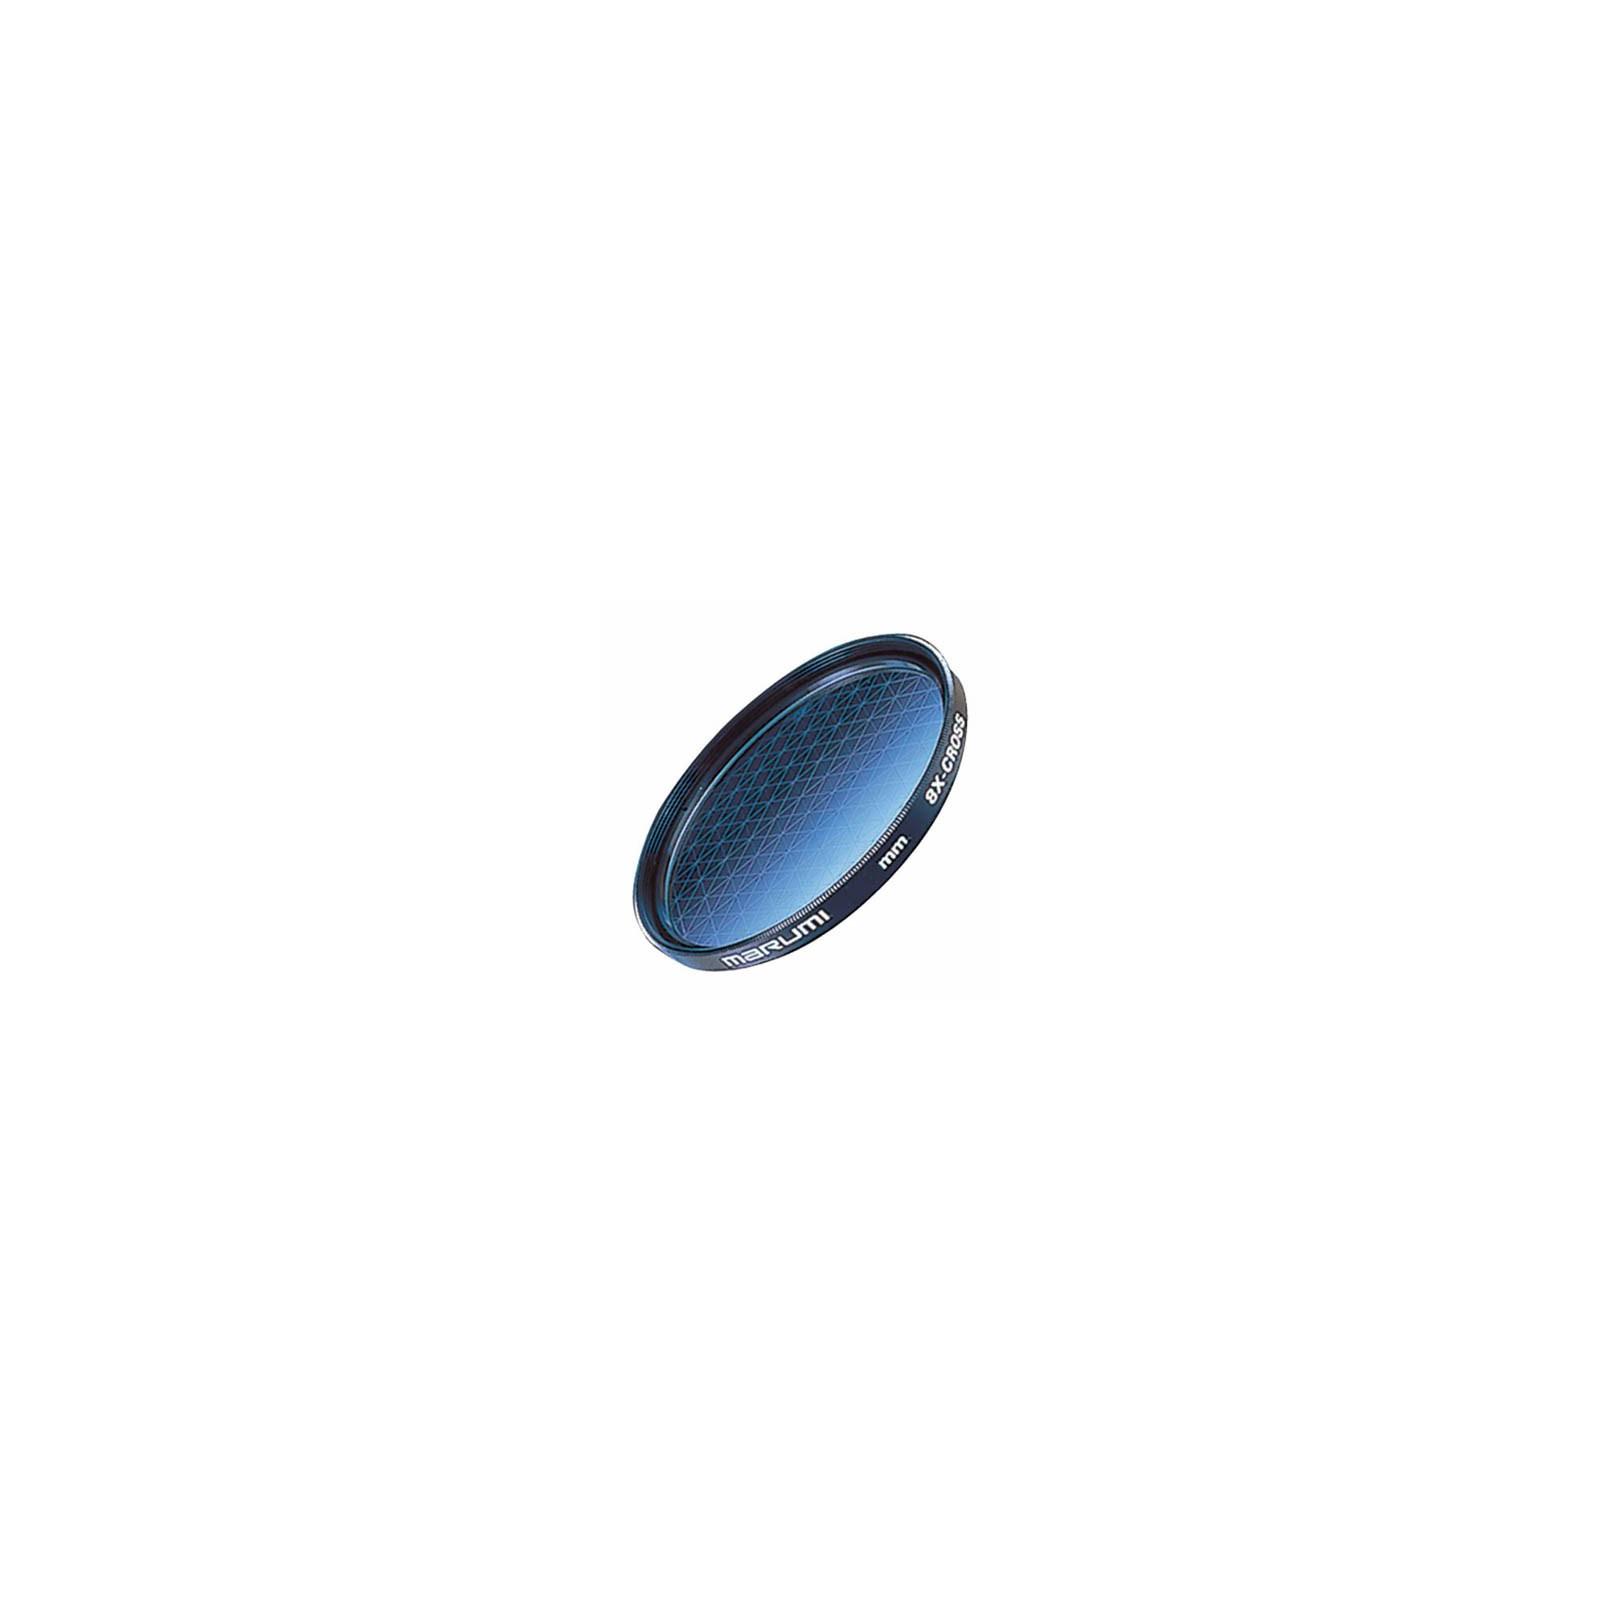 Светофильтр Marumi 8X-Cross 52mm